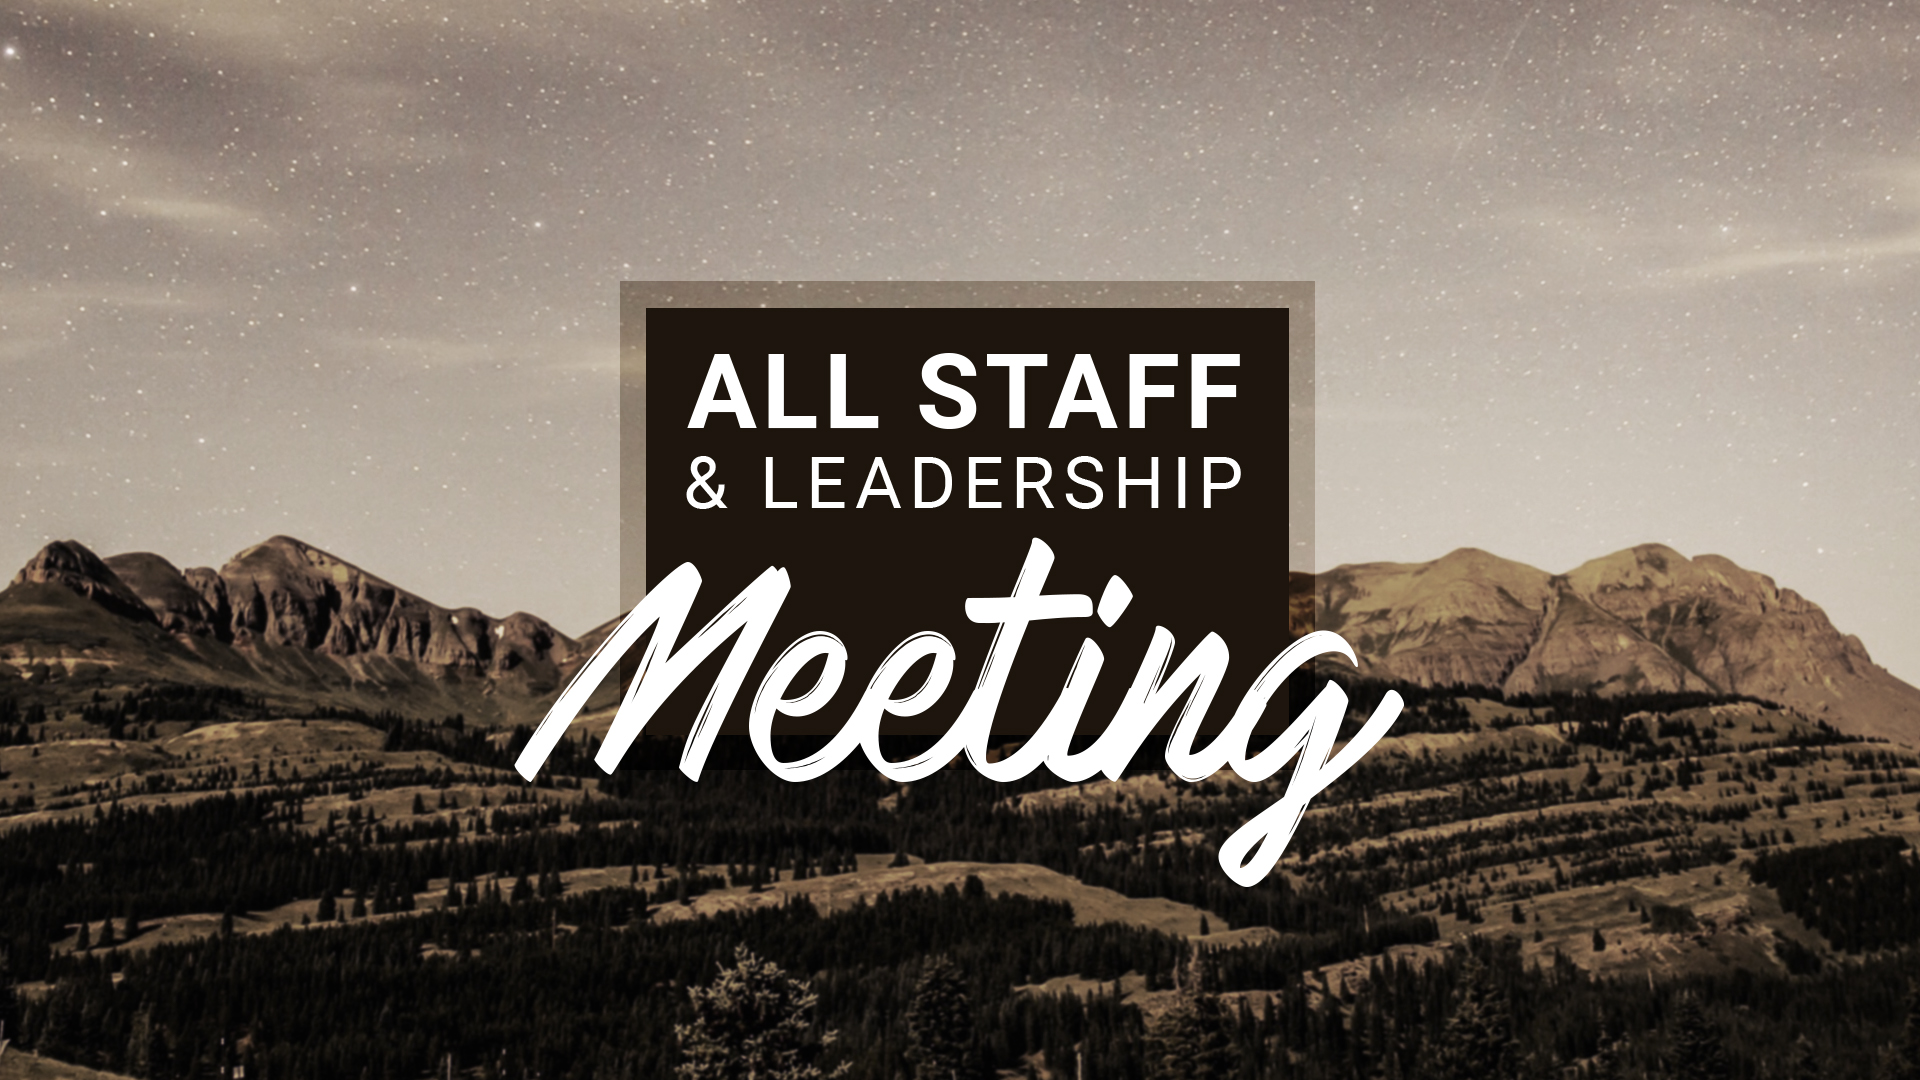 All Staff & Leadership Meeting - Graphics